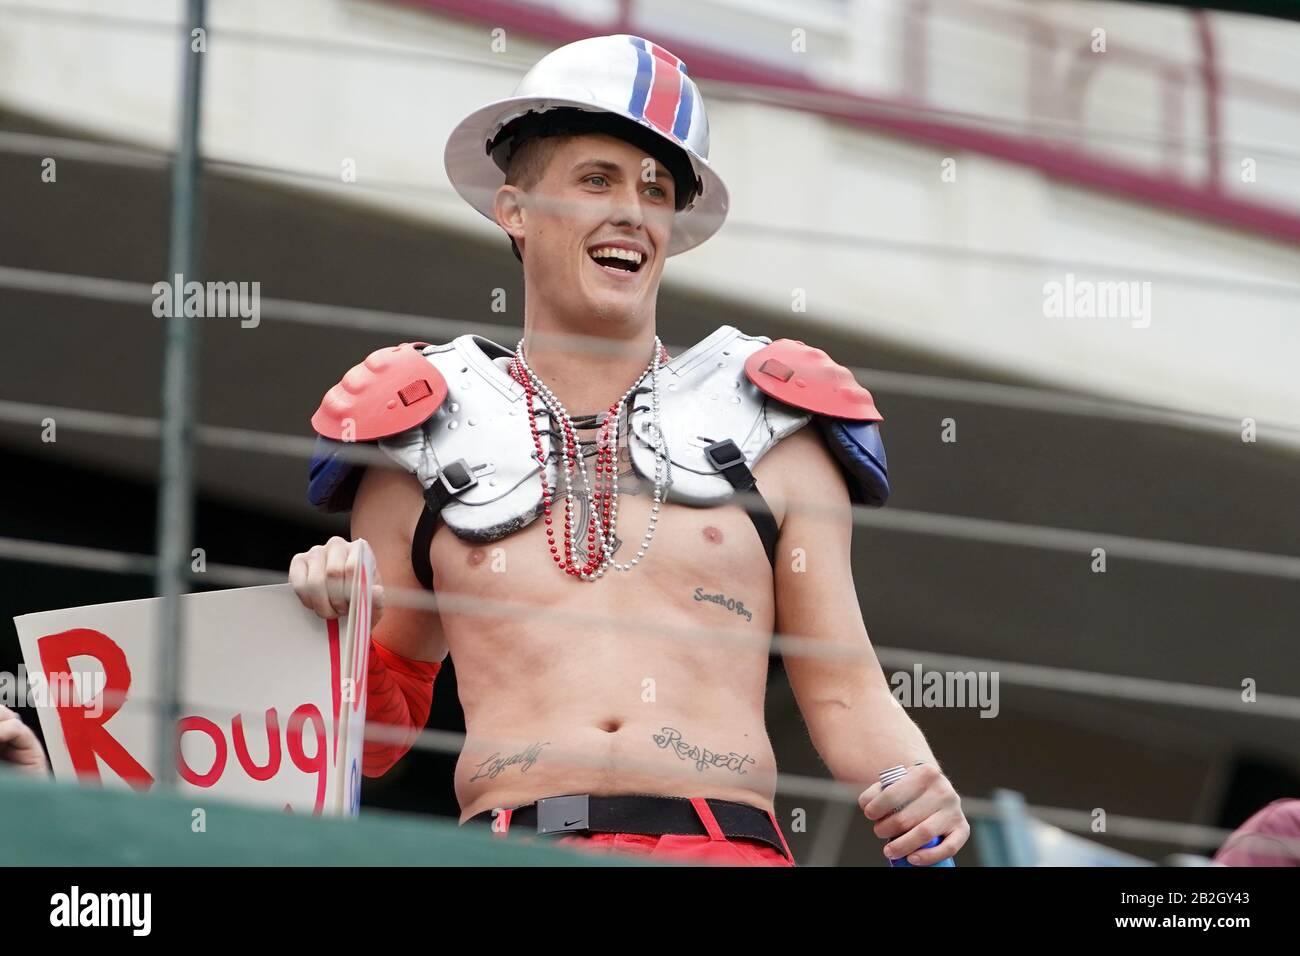 Houston Roughnecks fan showing team spirit an XFL football game, Sunday, Mar. 1, 2020, in Arlington, Texas, USA. (Photo by IOS/ESPA-Images) Stock Photo